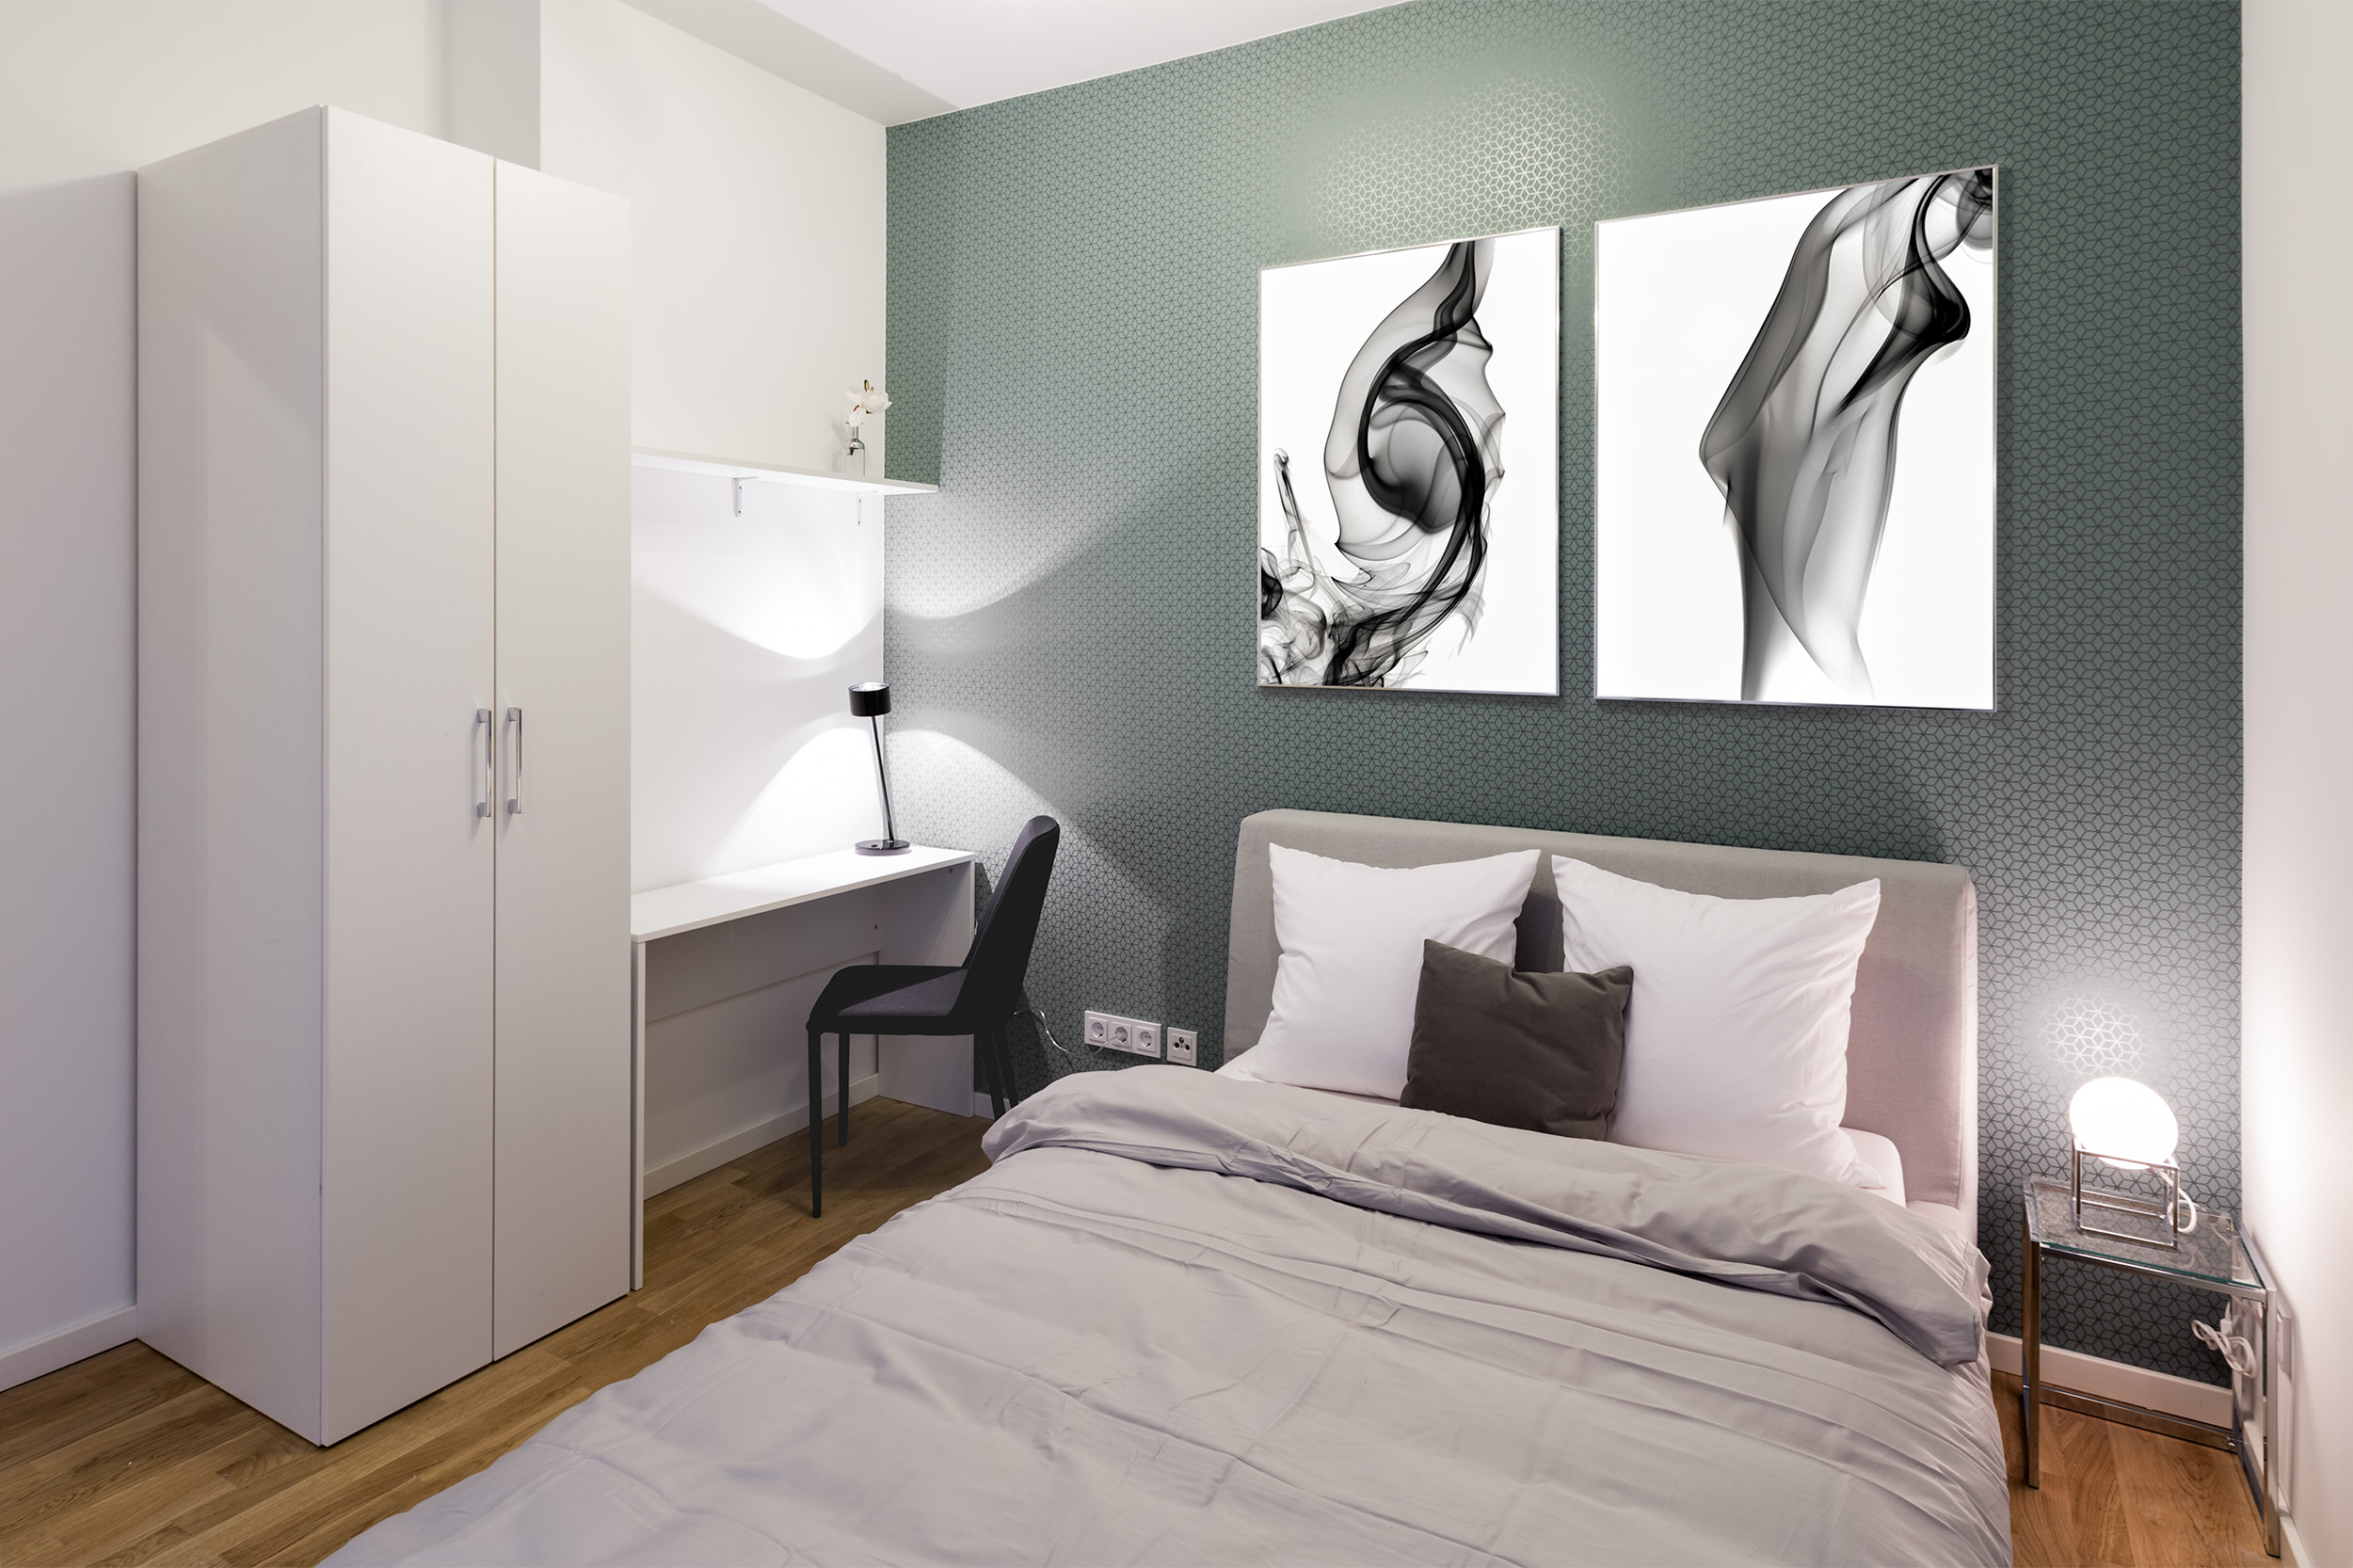 re-vamp+möbliertes+Mikropapartment+WE+207+Gästezimmer.jpg